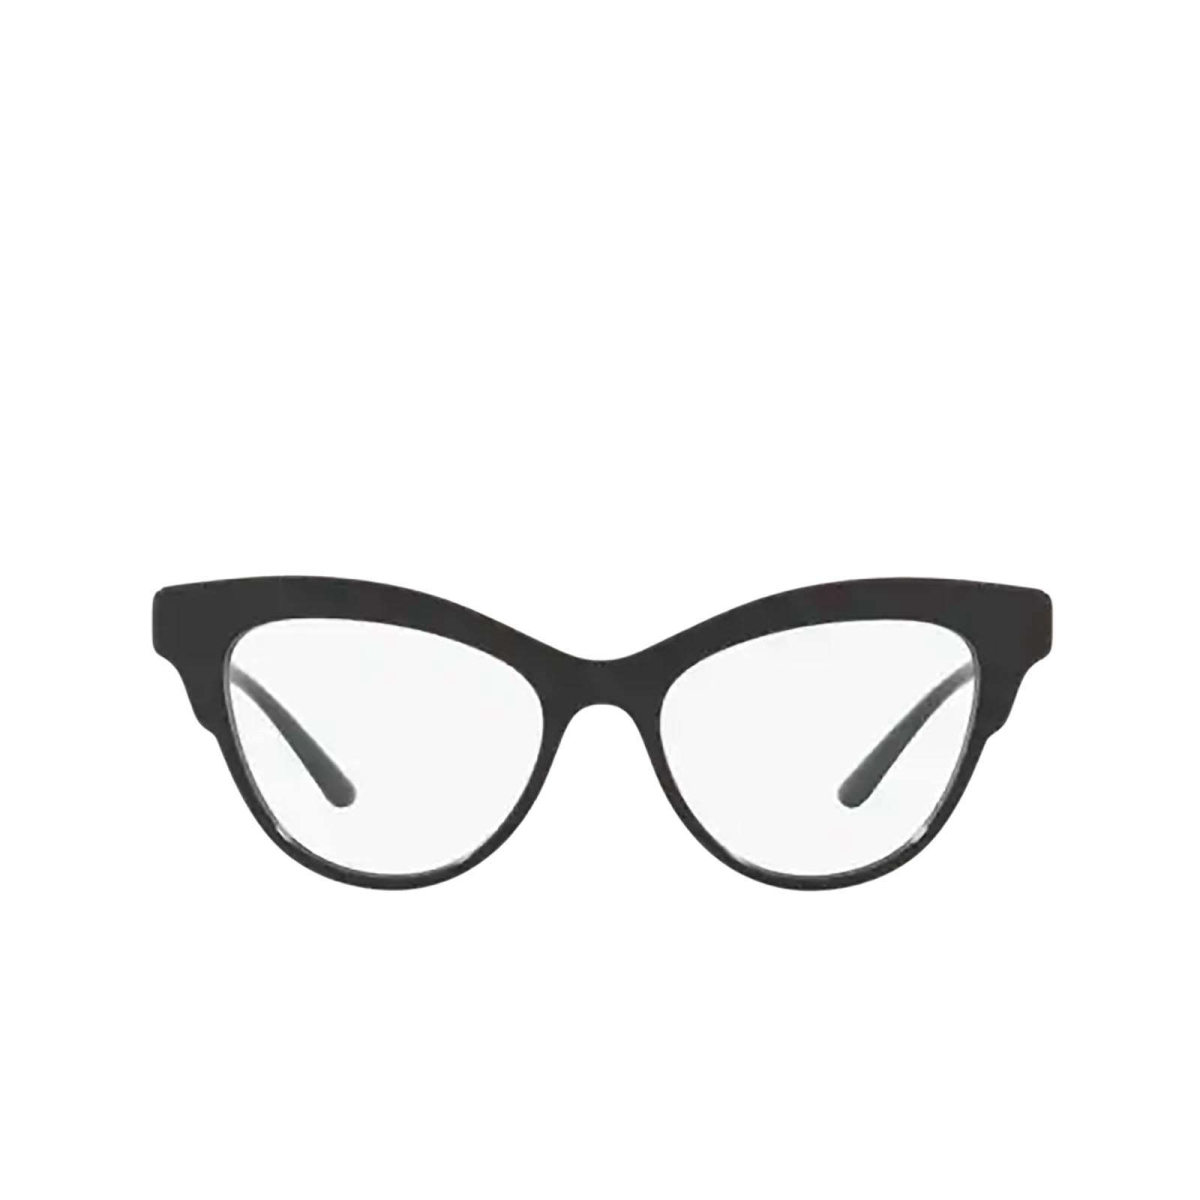 Dolce & Gabbana® Butterfly Eyeglasses: DG3313 color Black 501 - front view.